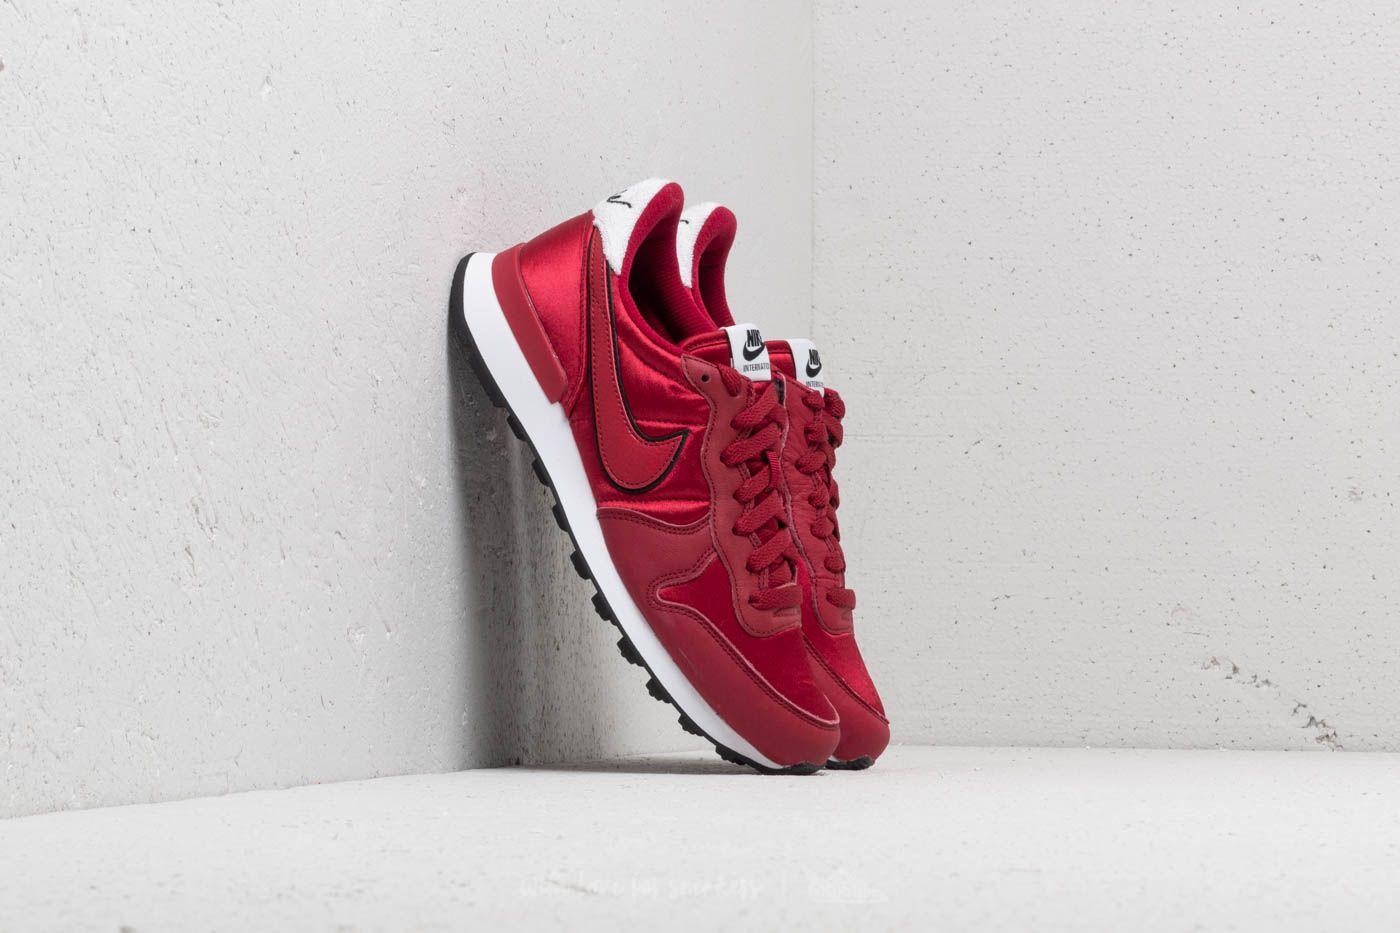 Wmns WhiteFootshop Cruhs Nike Crush Red Internationalist Heat n0wv8mN